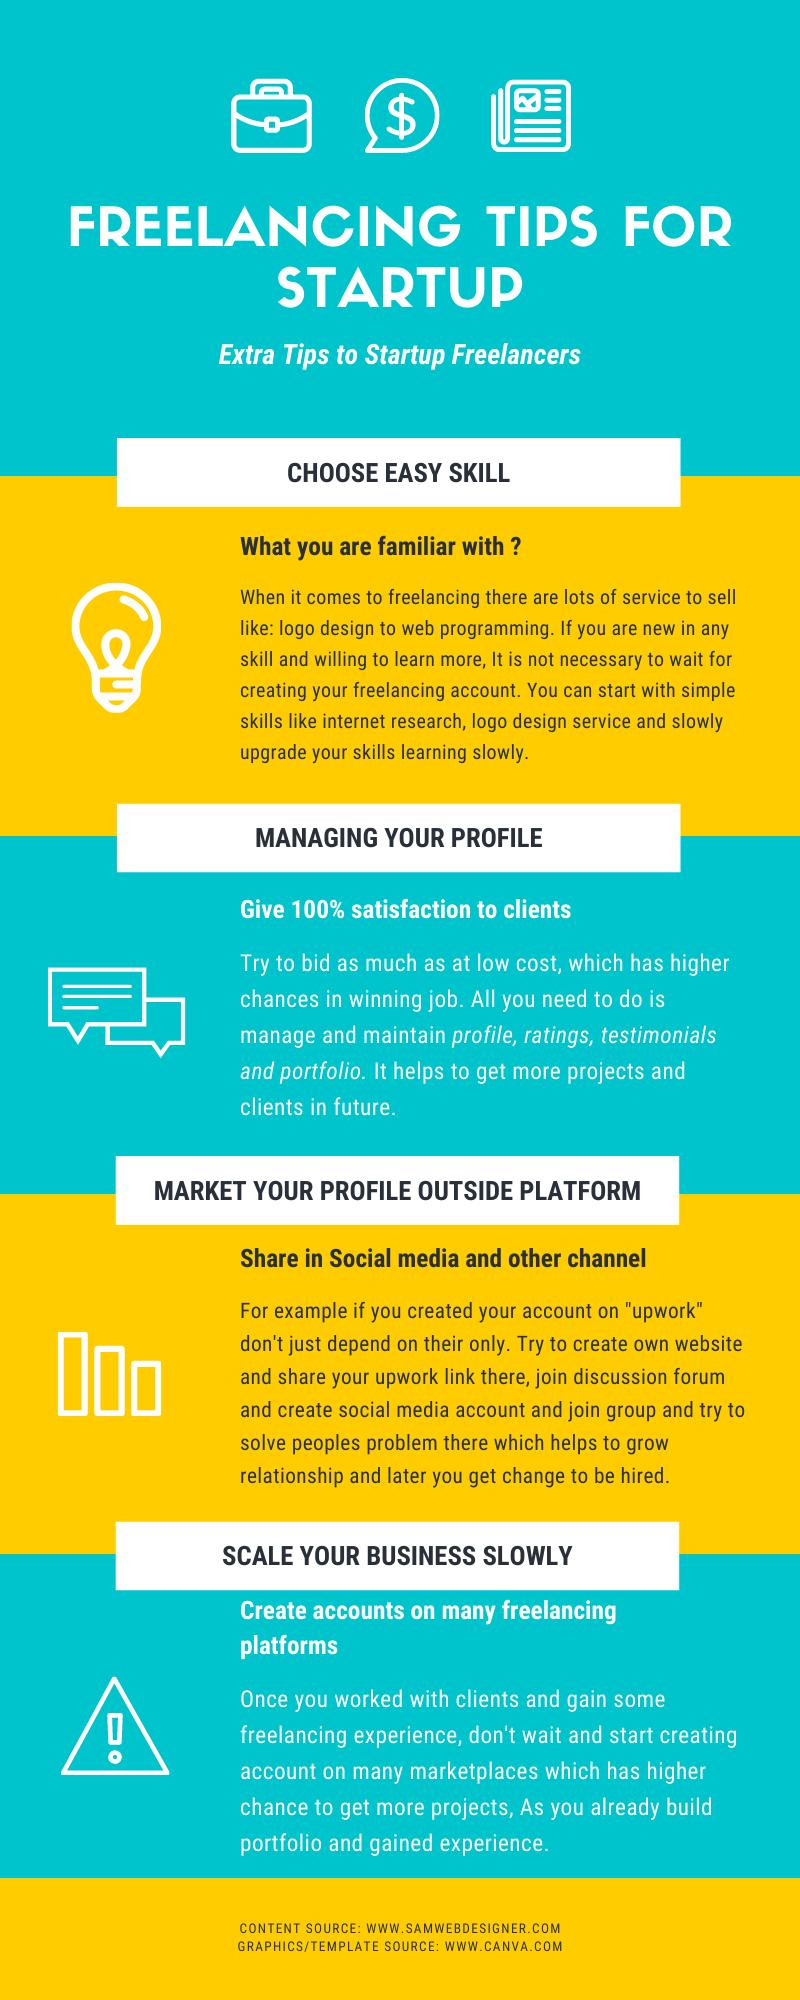 Freelancing tips for startup